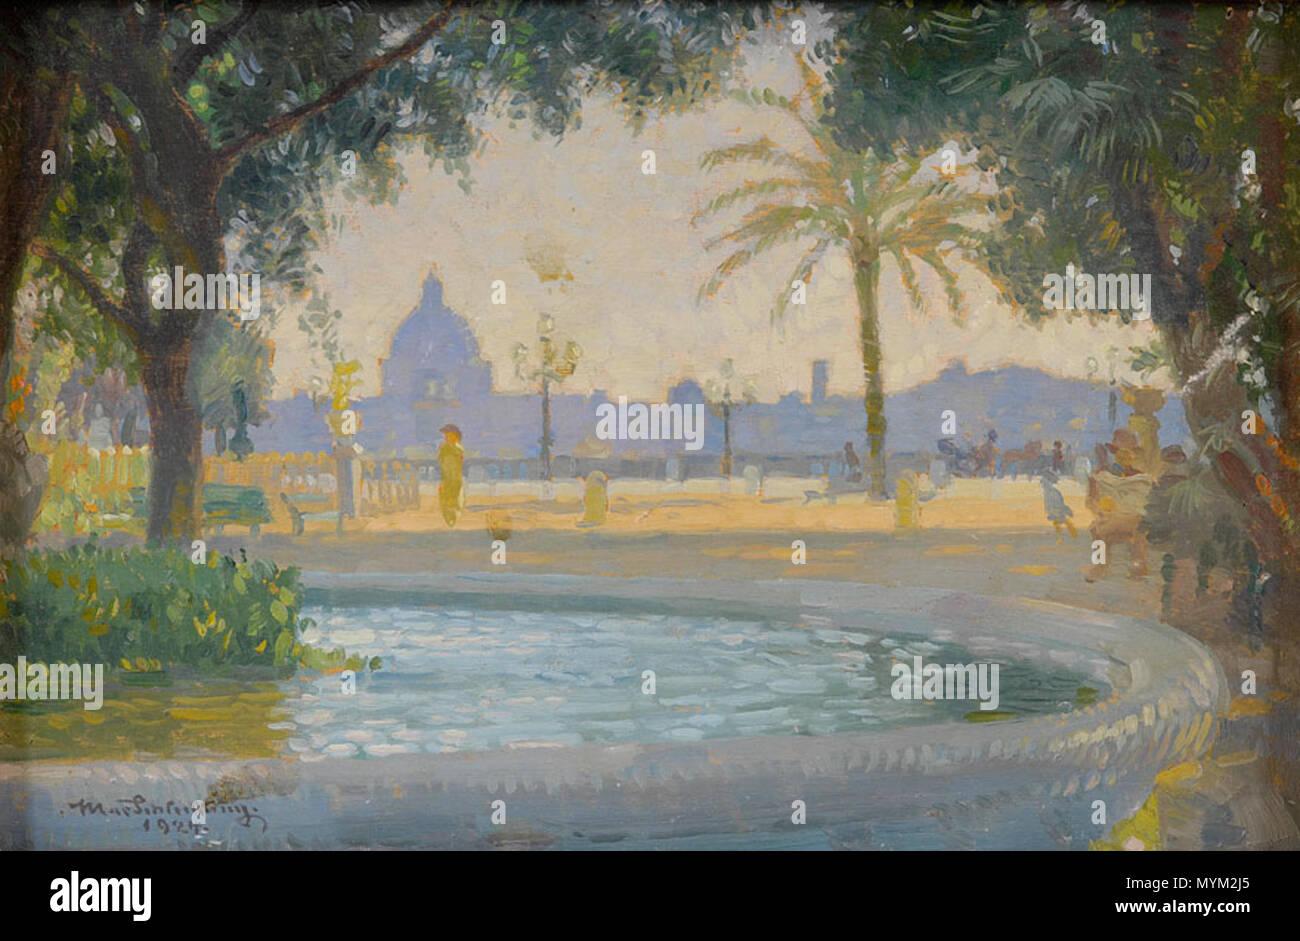 . Monte Pincio, Roma, Öl auf Holz, 15,5 x 23,5 cm . 19th/20th century. Max Schlichting (1866–1937) 356 Max Schlichting Monte Pincio - Stock Image